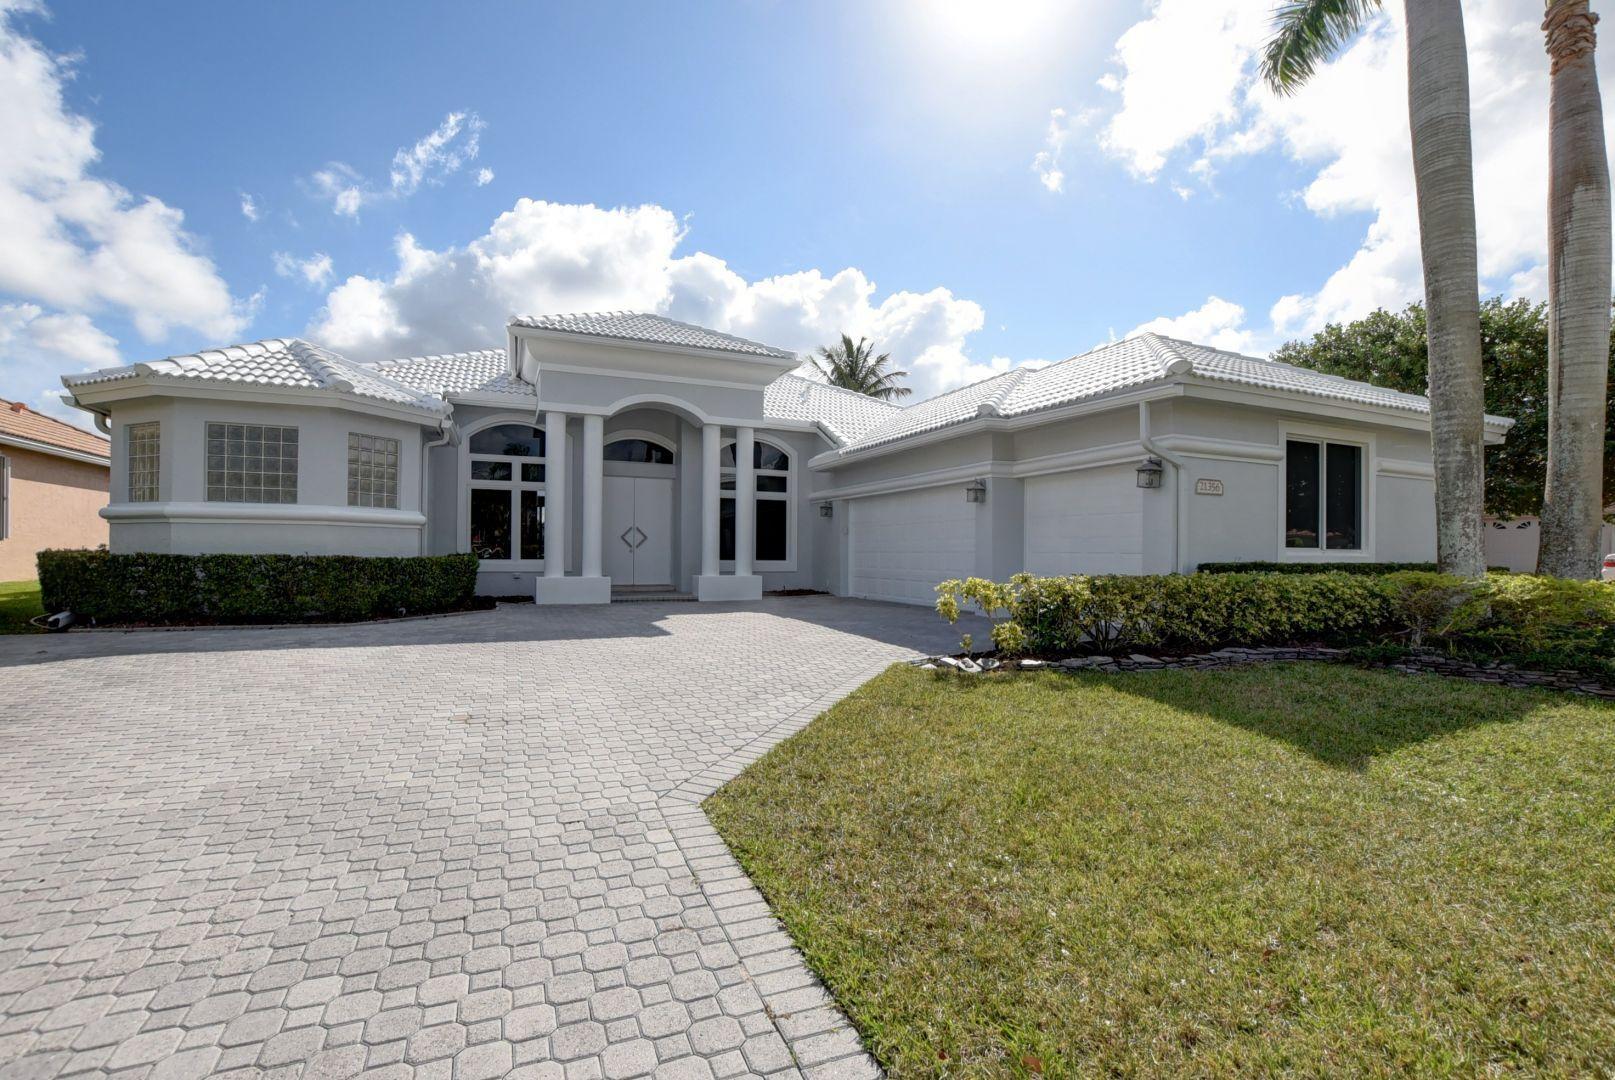 Photo of 21356 Shannon Ridge Way, Boca Raton, FL 33428